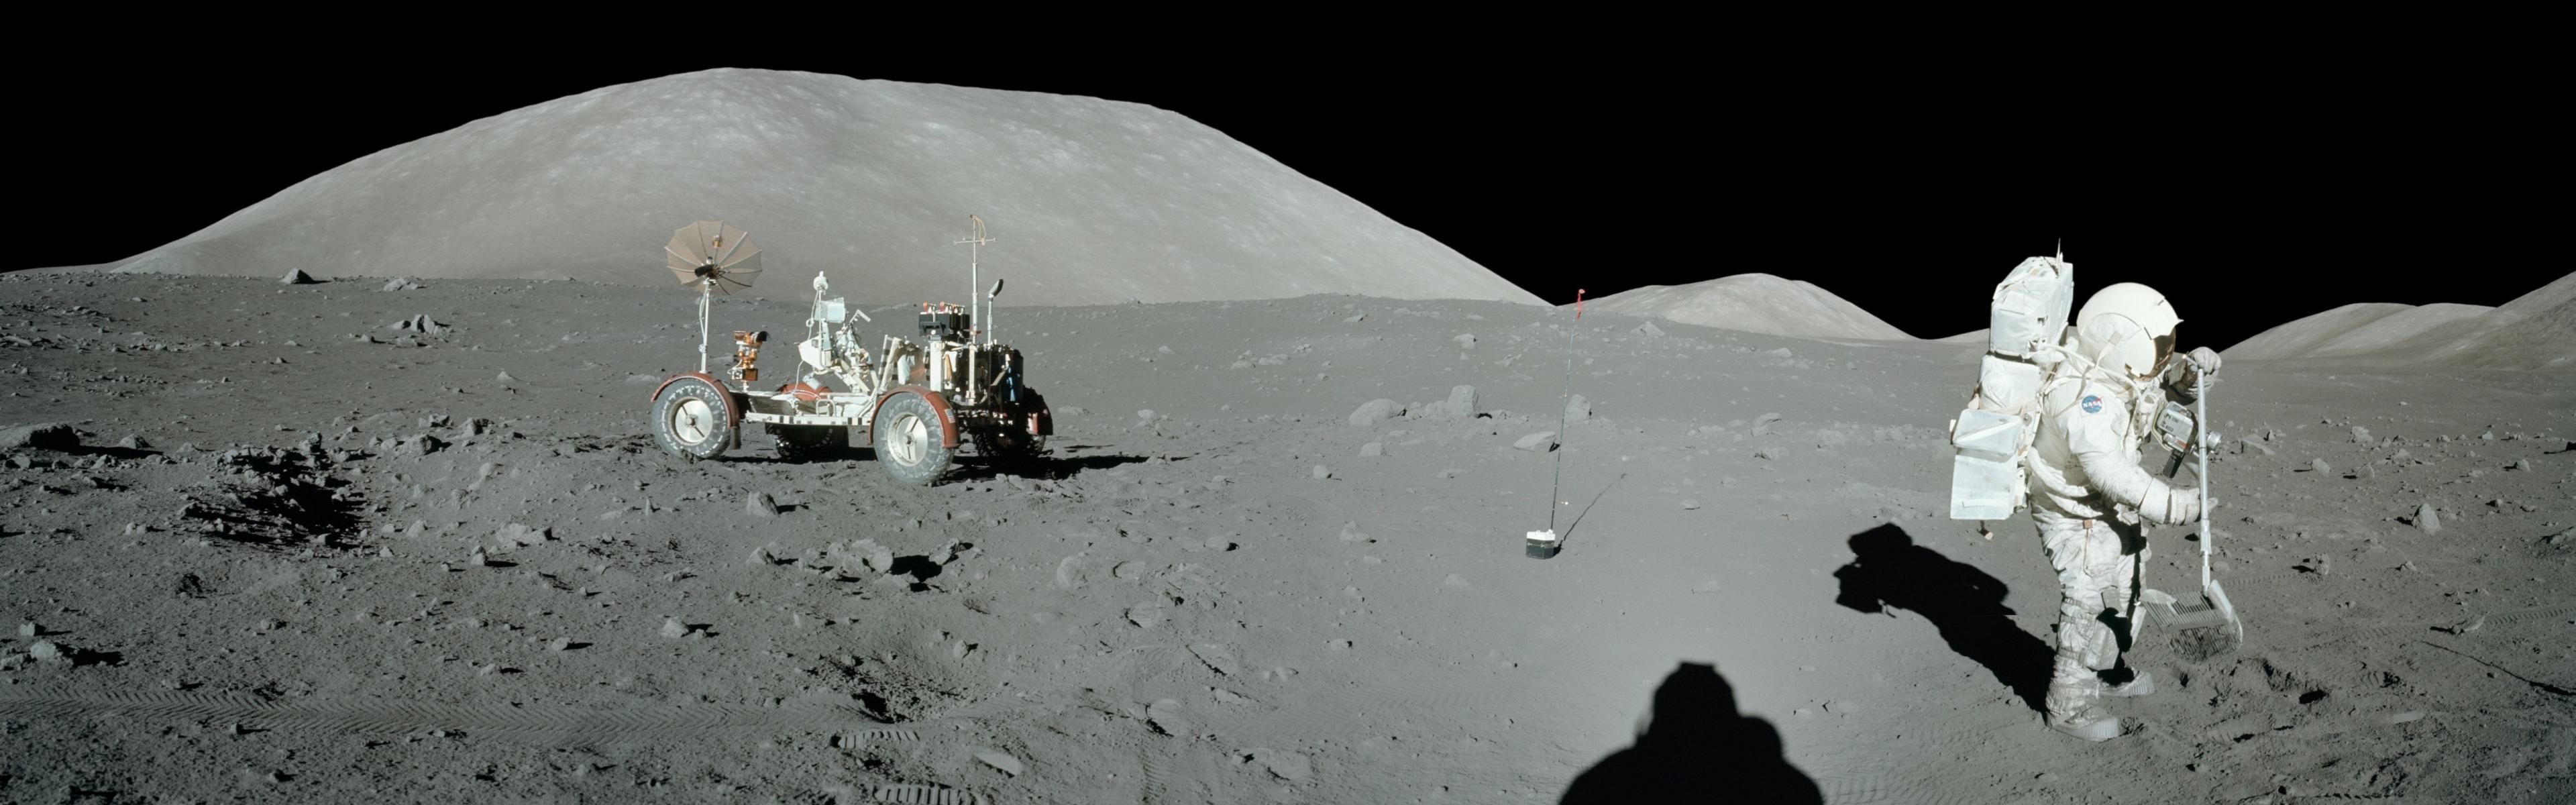 3840x1200   dual monitor wallpaper   lunar landing Wallpapers 3840x1200